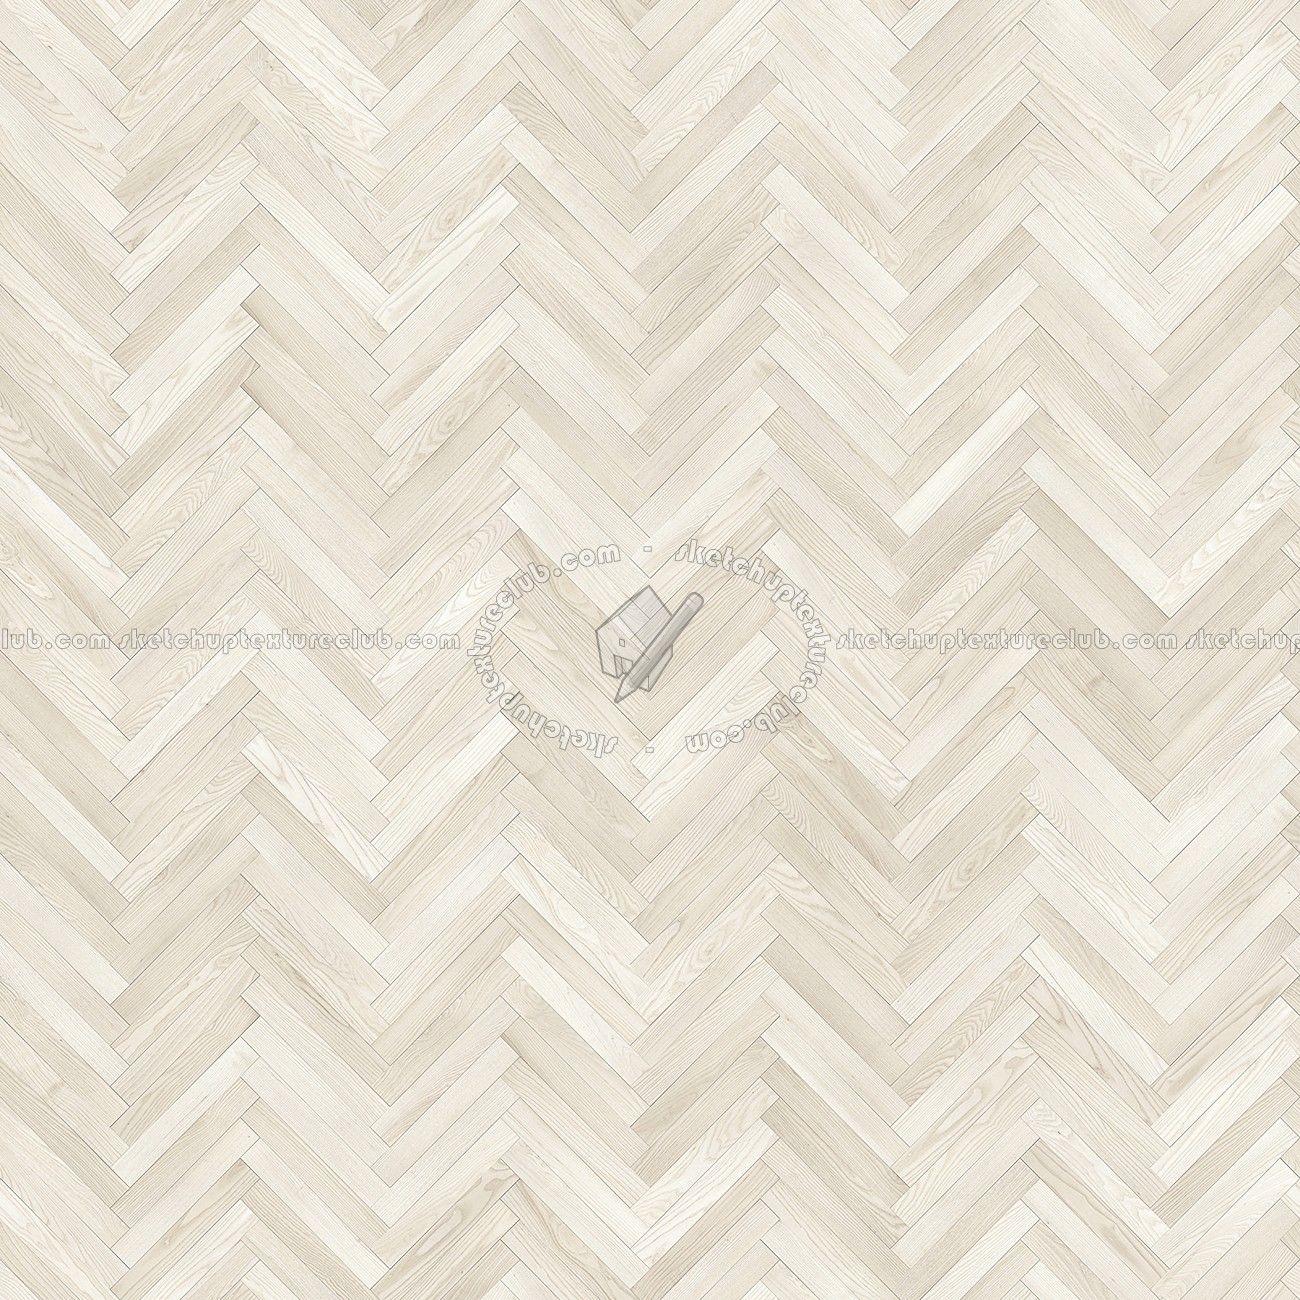 Texture Seamless Herringbone White Wood Flooring Texture